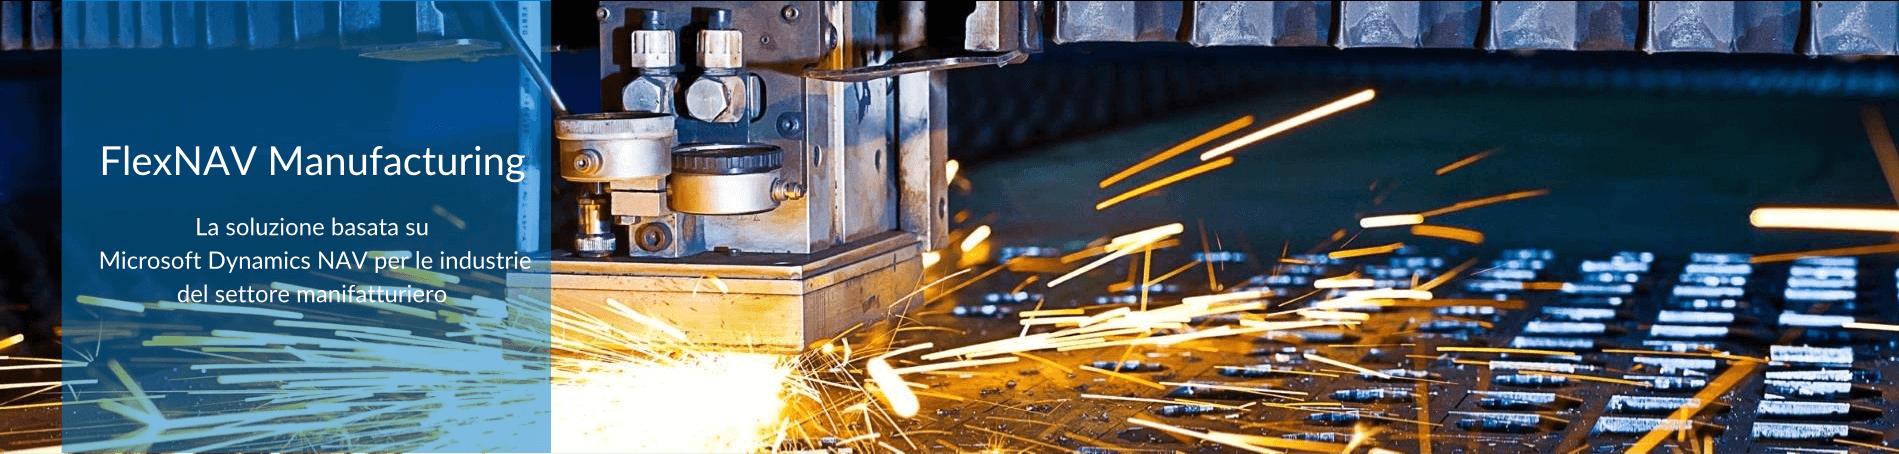 flexnav microsoft dynamics nav settore manifatturiero